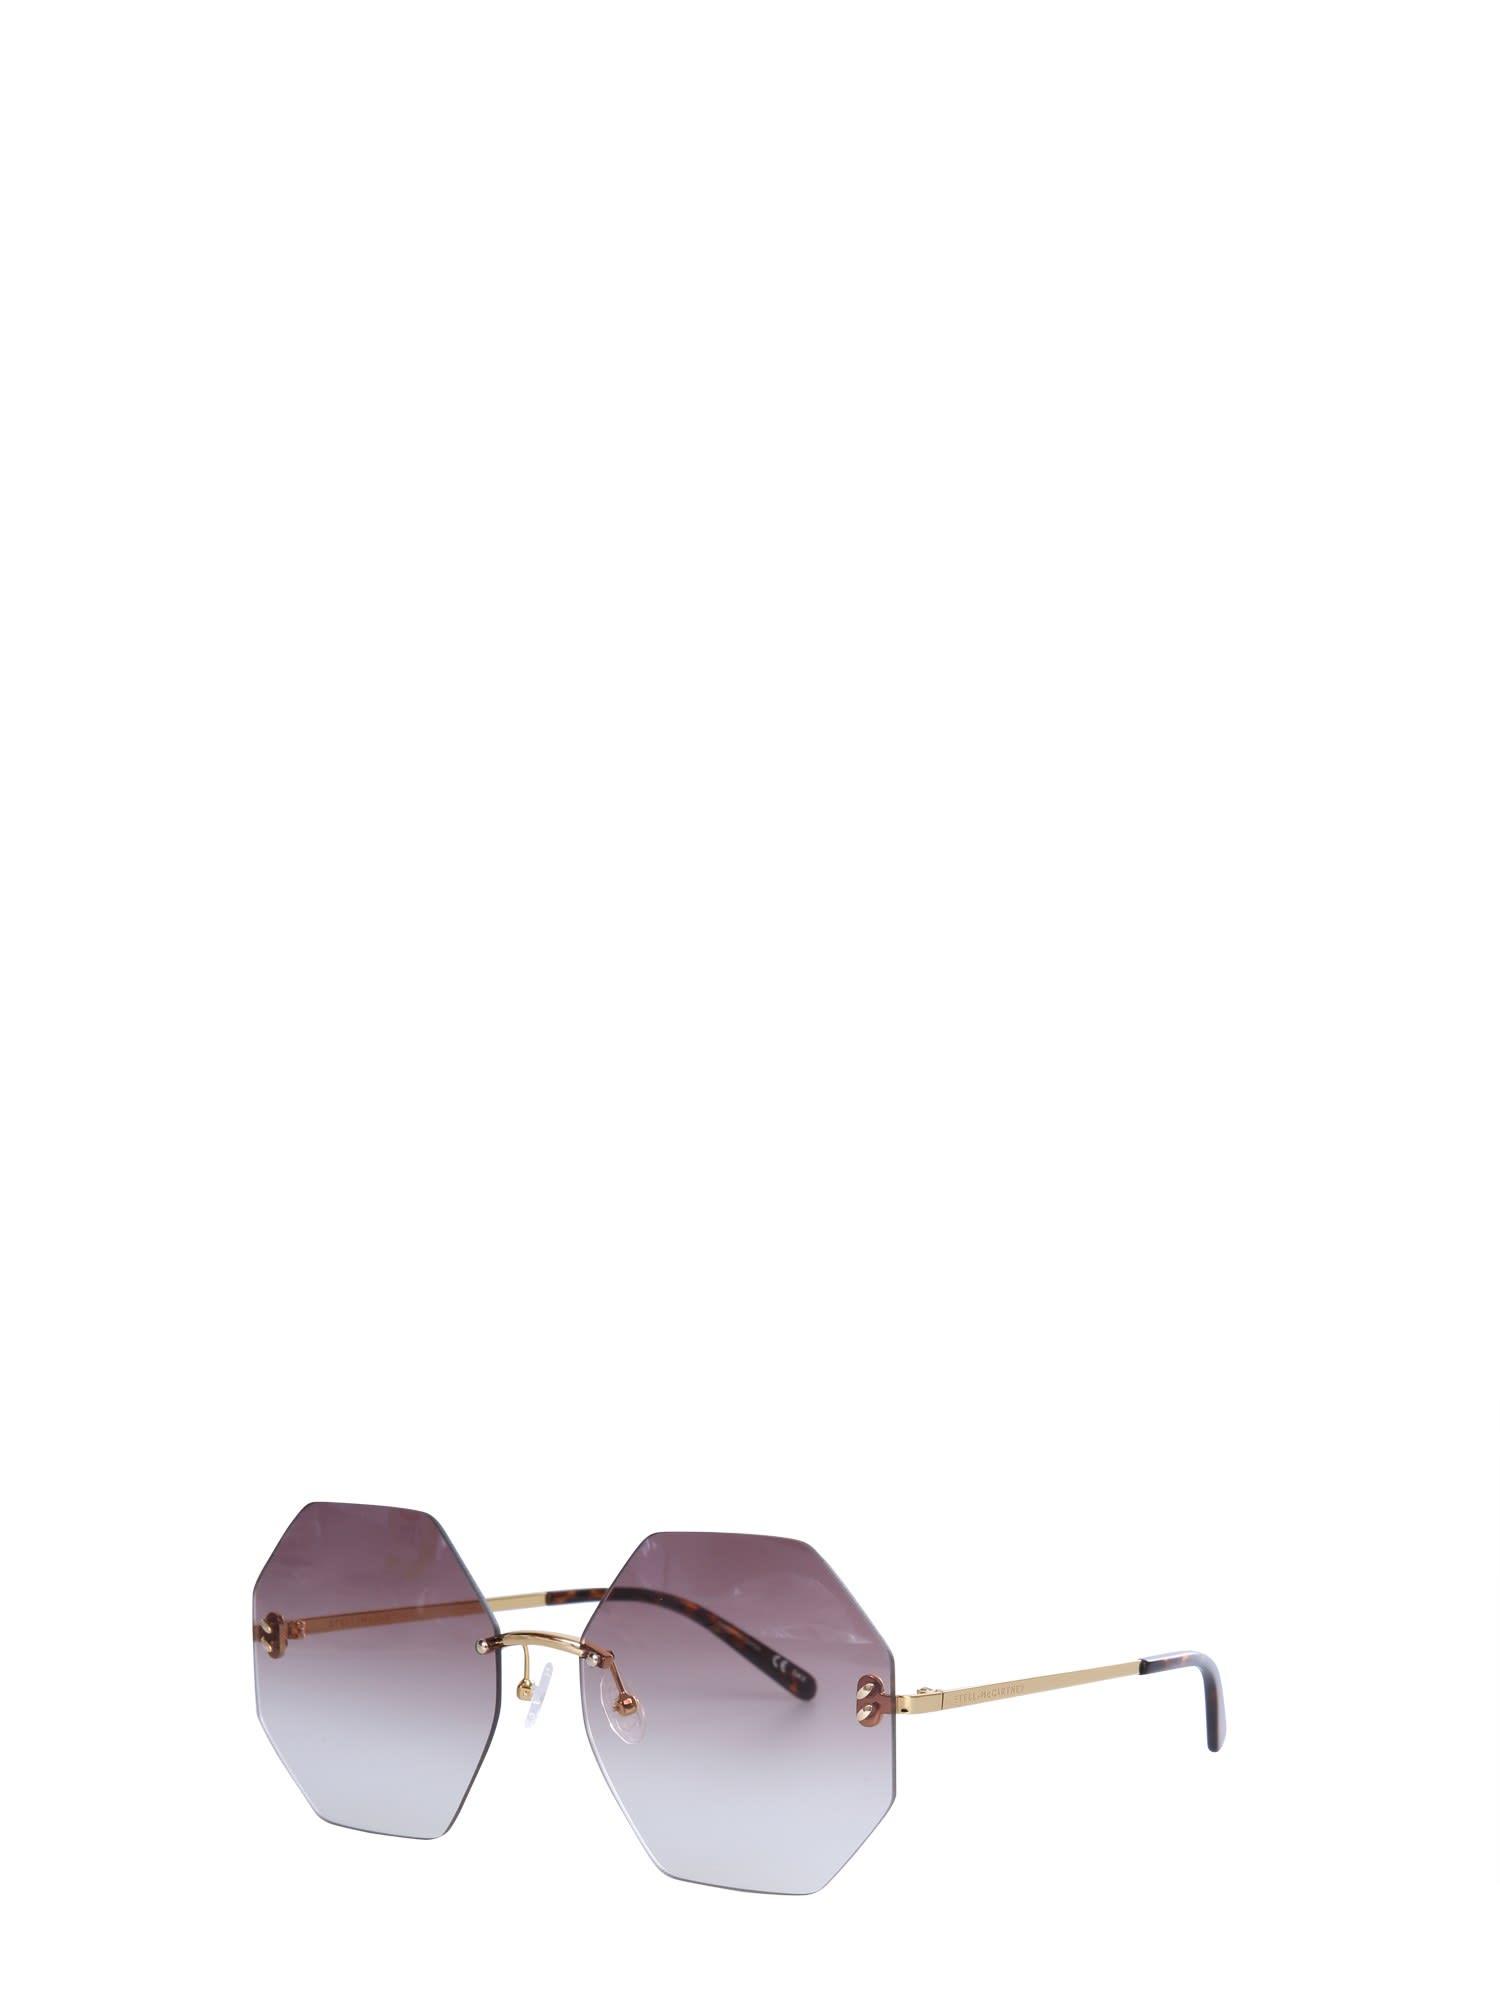 Stella McCartney Geometric Sunglasses